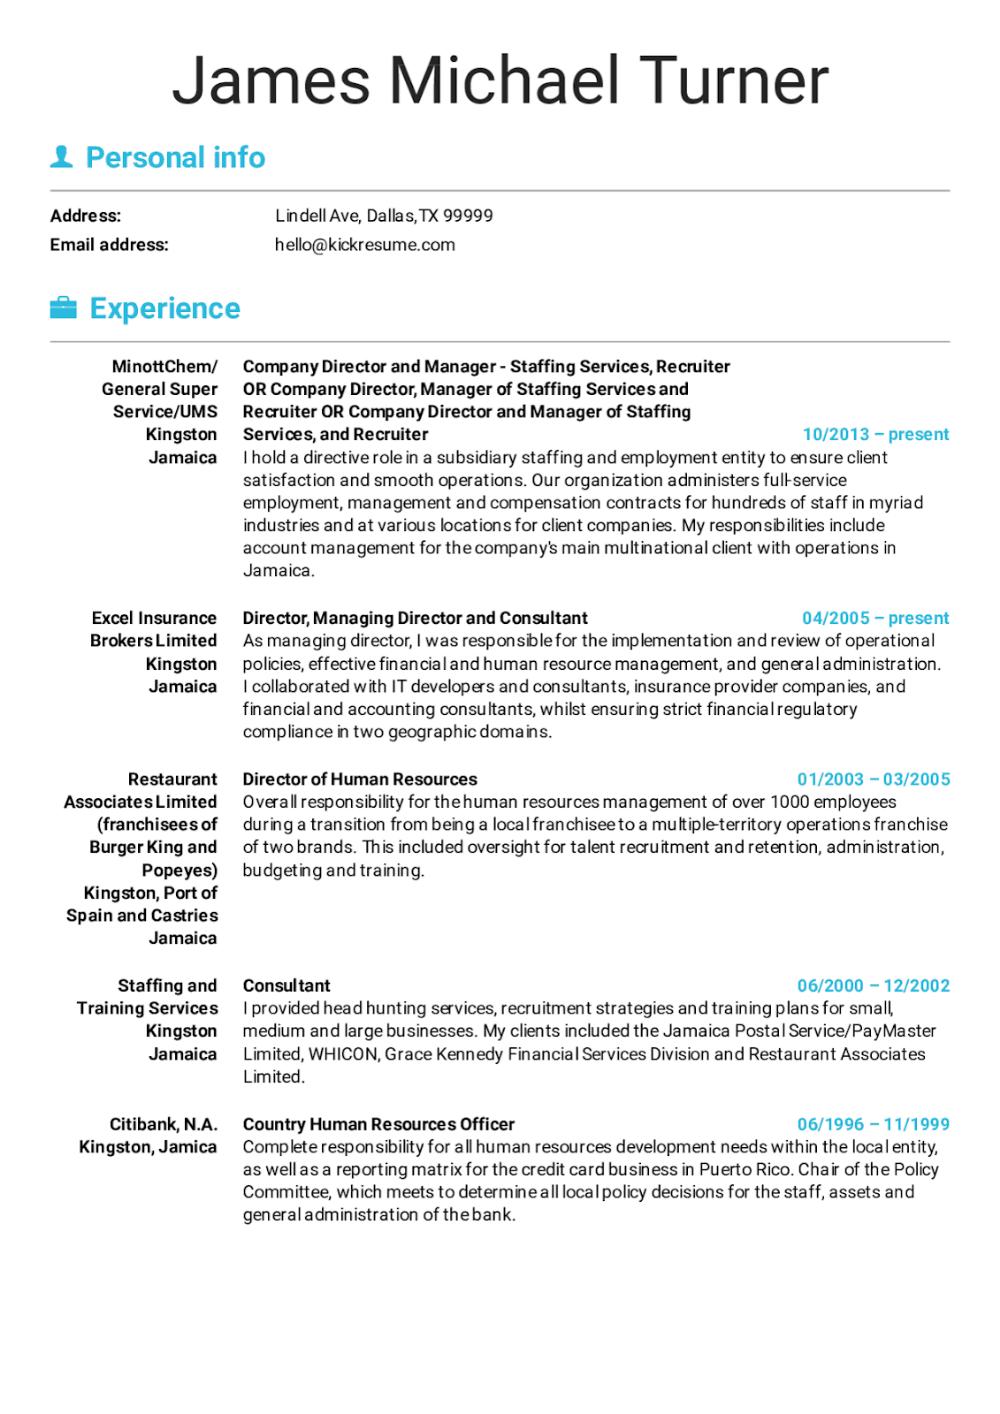 Data Analyst Resume Examples 2019 Data Analyst Resume Sample 2020 Data Analyst Resume Examples Resume Summary